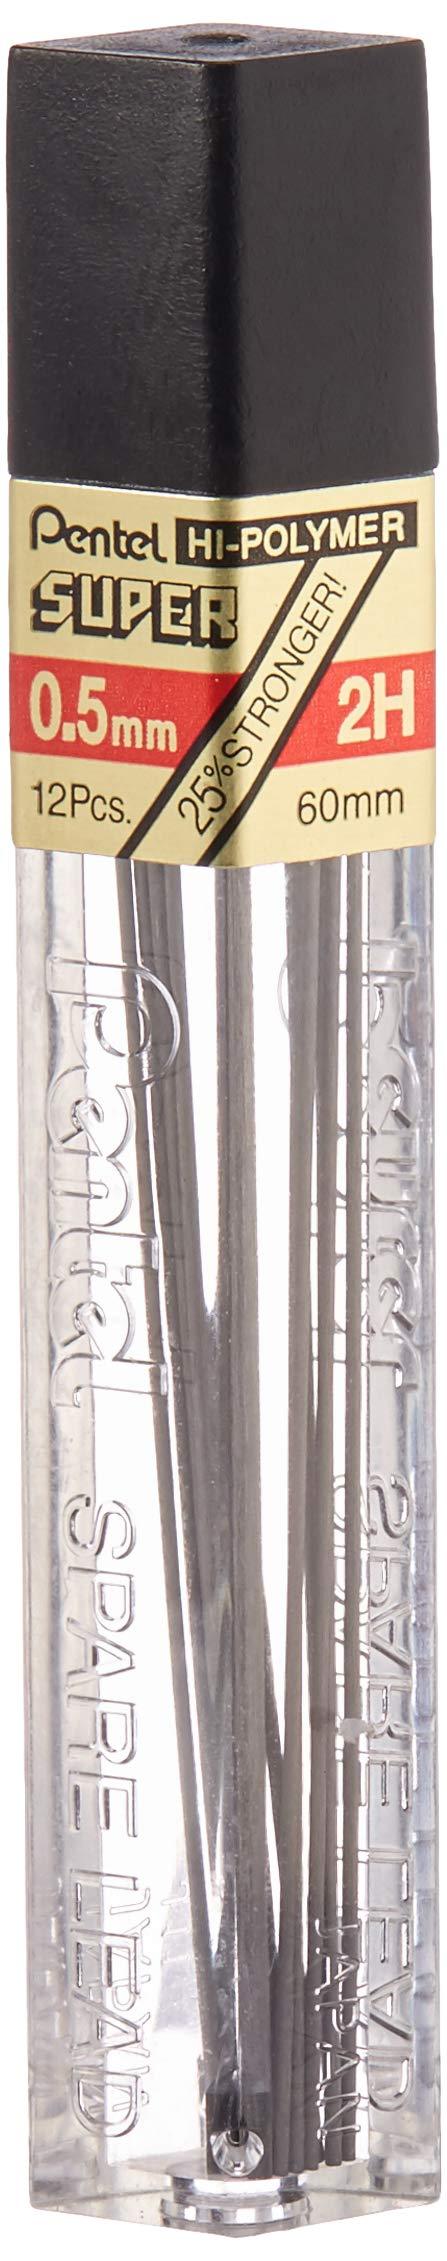 Pentel Super Hi-Polymer 144 Minas (12 Tubos) 0.5mm 2H